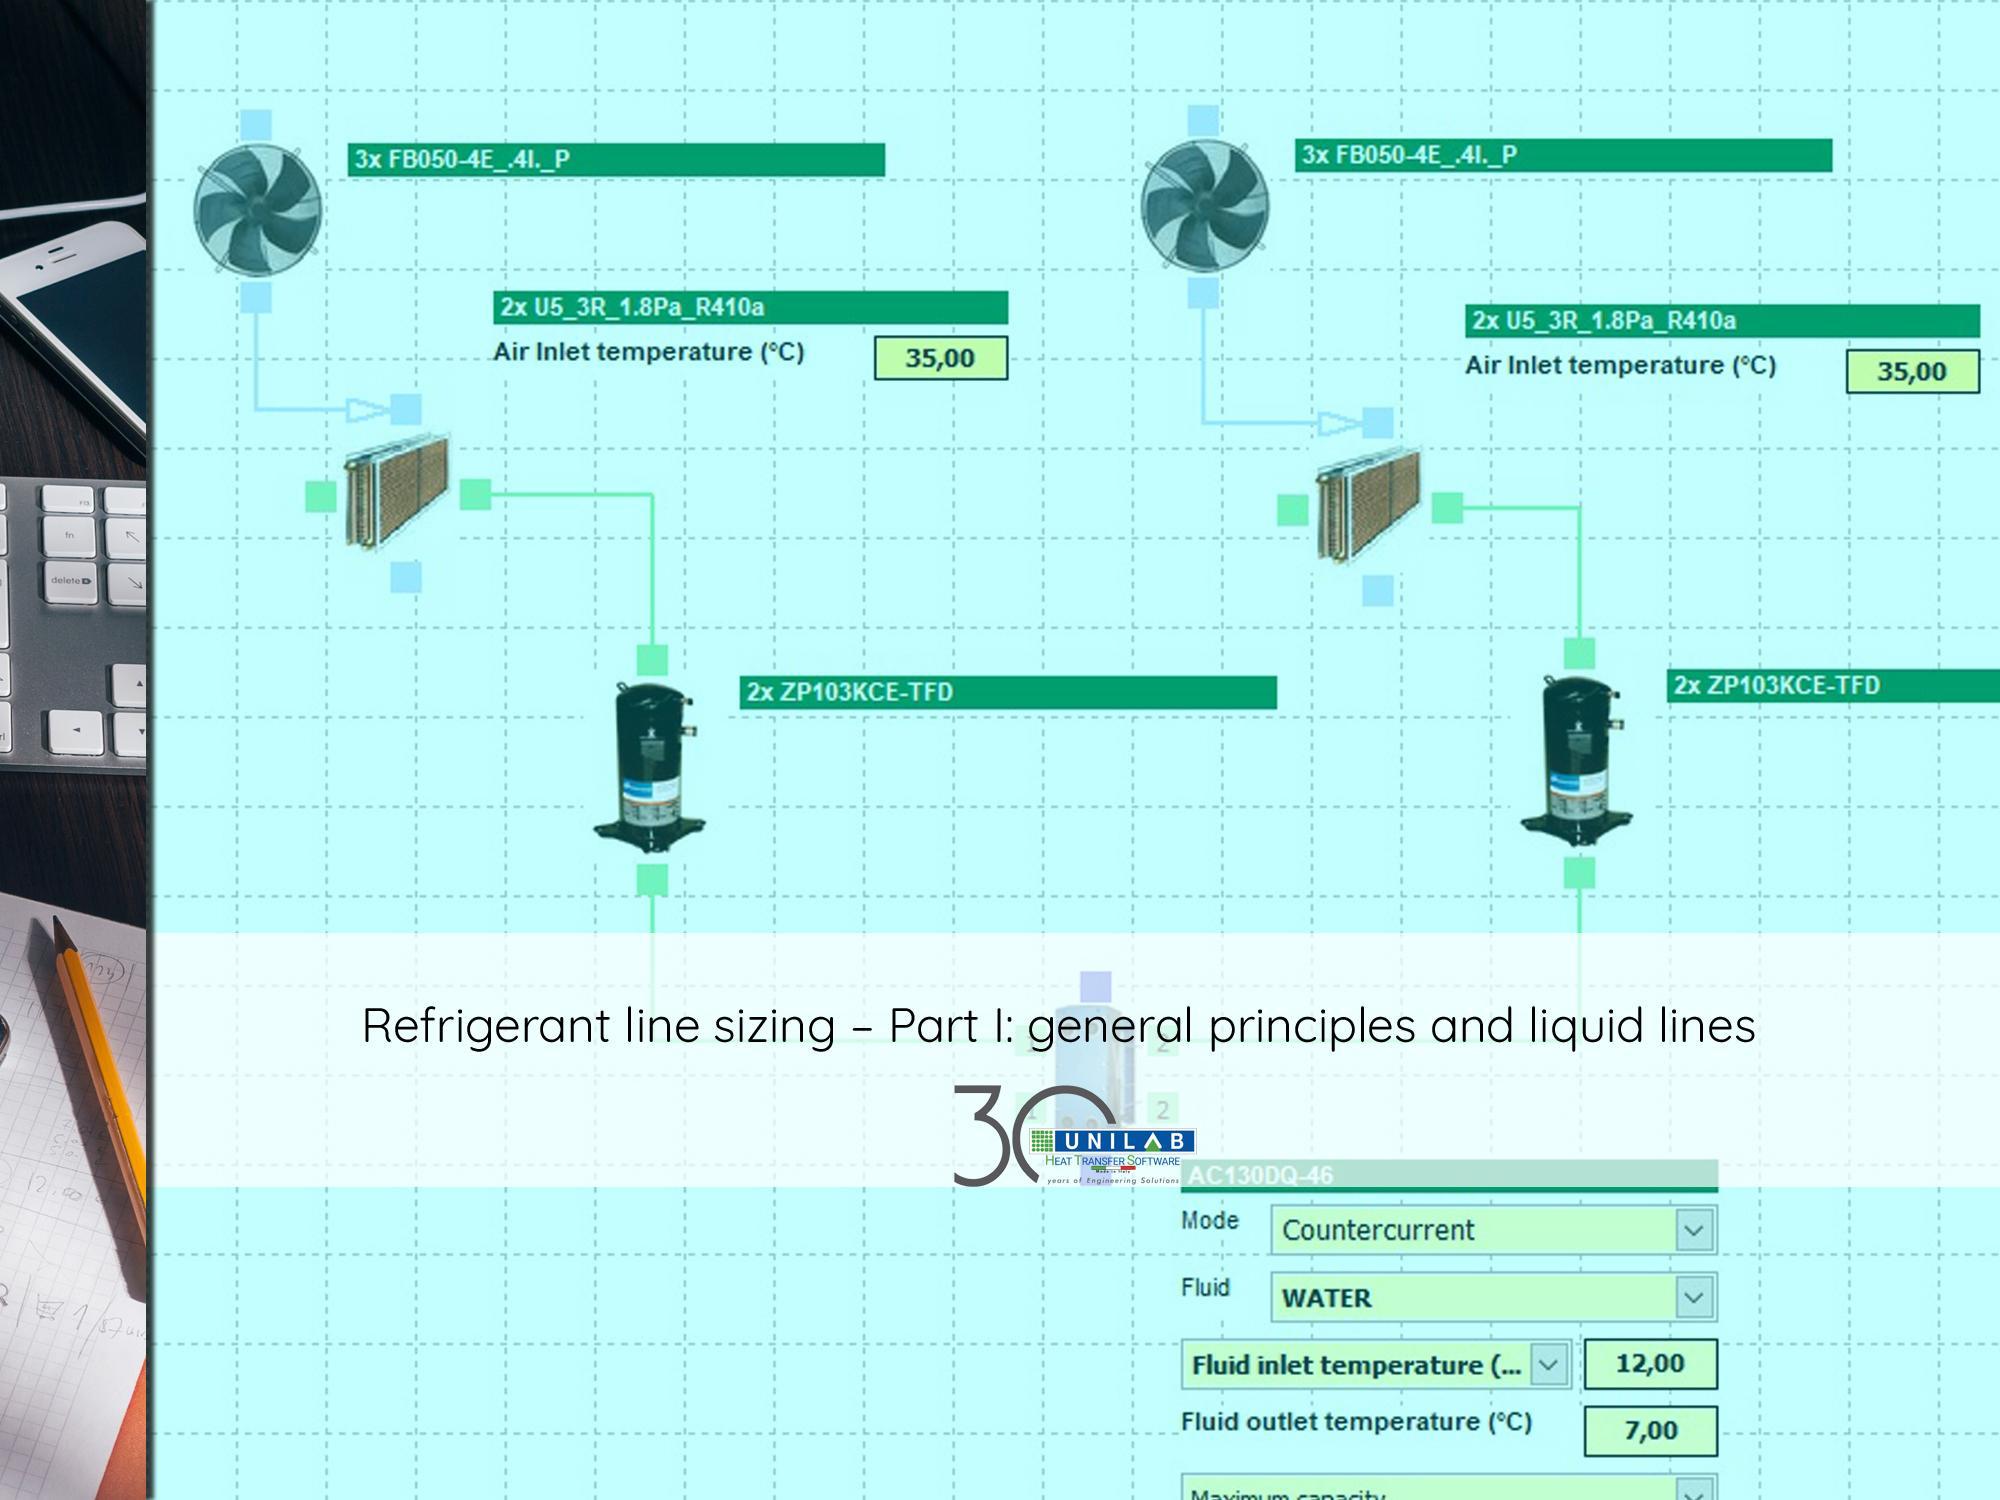 Air Compressor Sizing Spreadsheet Regarding Refrigerant Line Sizing – Part I: General Principles And Liquid